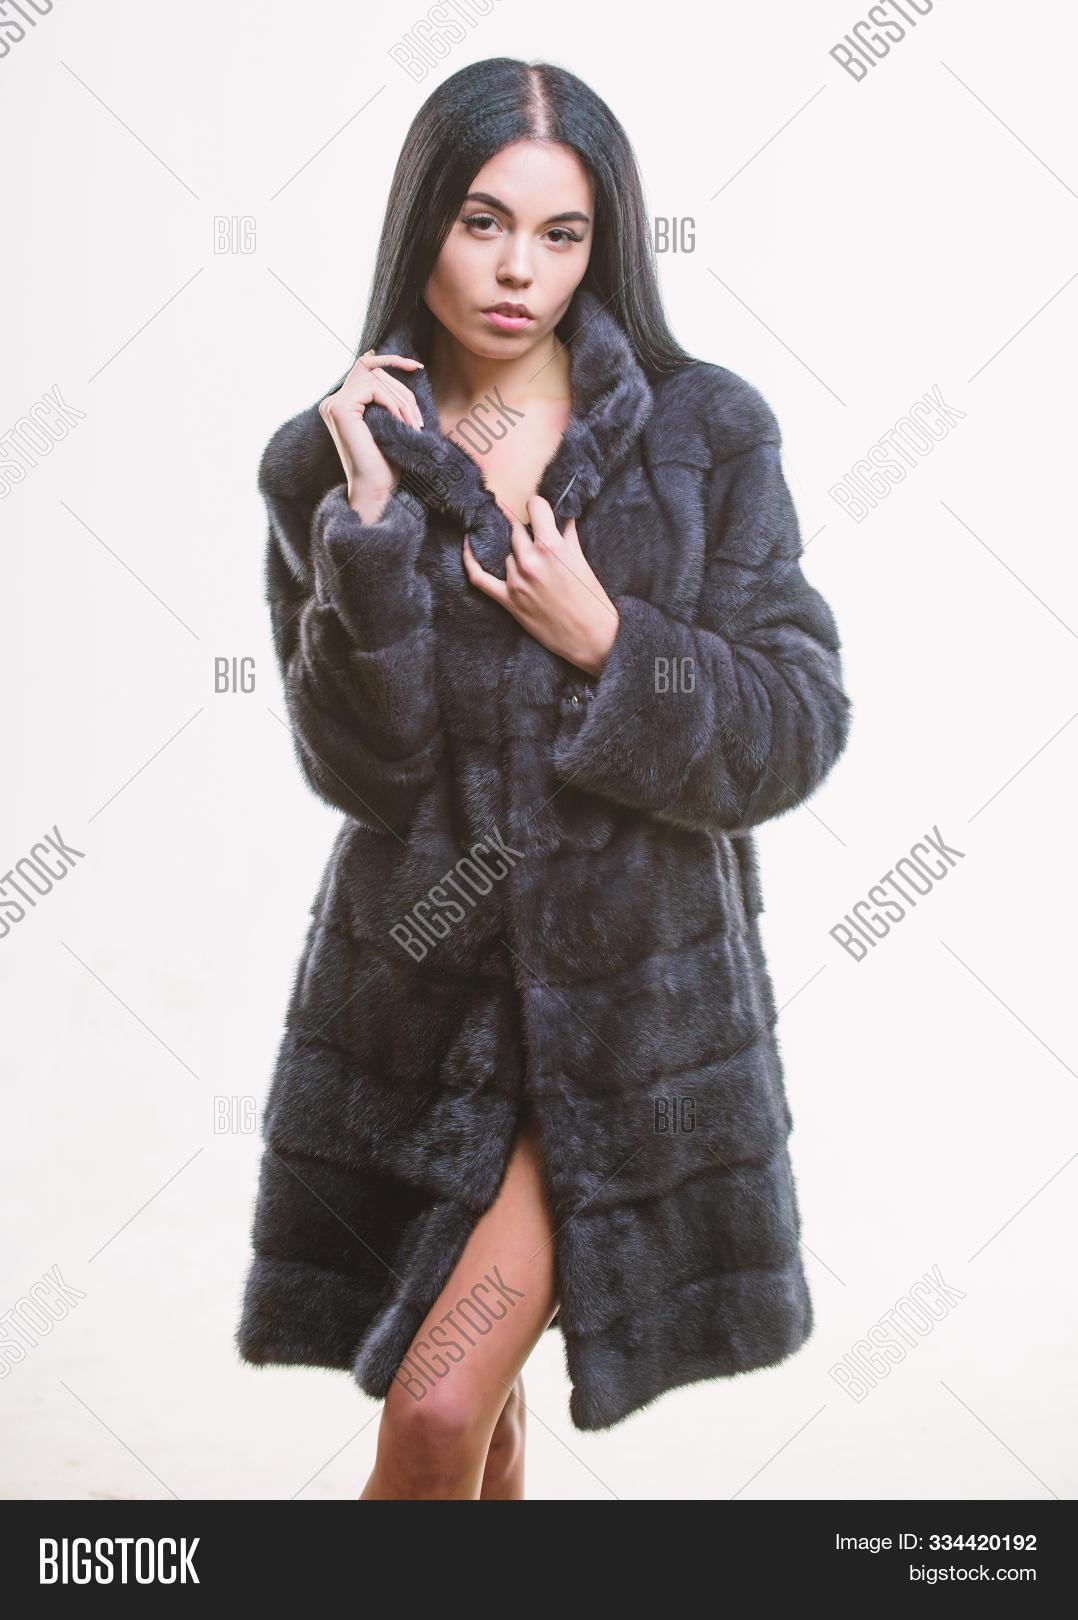 Girl elegant lady wear fashionable coat jacket. Luxurious fur. Woman attractive model wear dark soft coat. Fashion concept. Female with makeup wear mink black fur coat. Girl posing fur coat